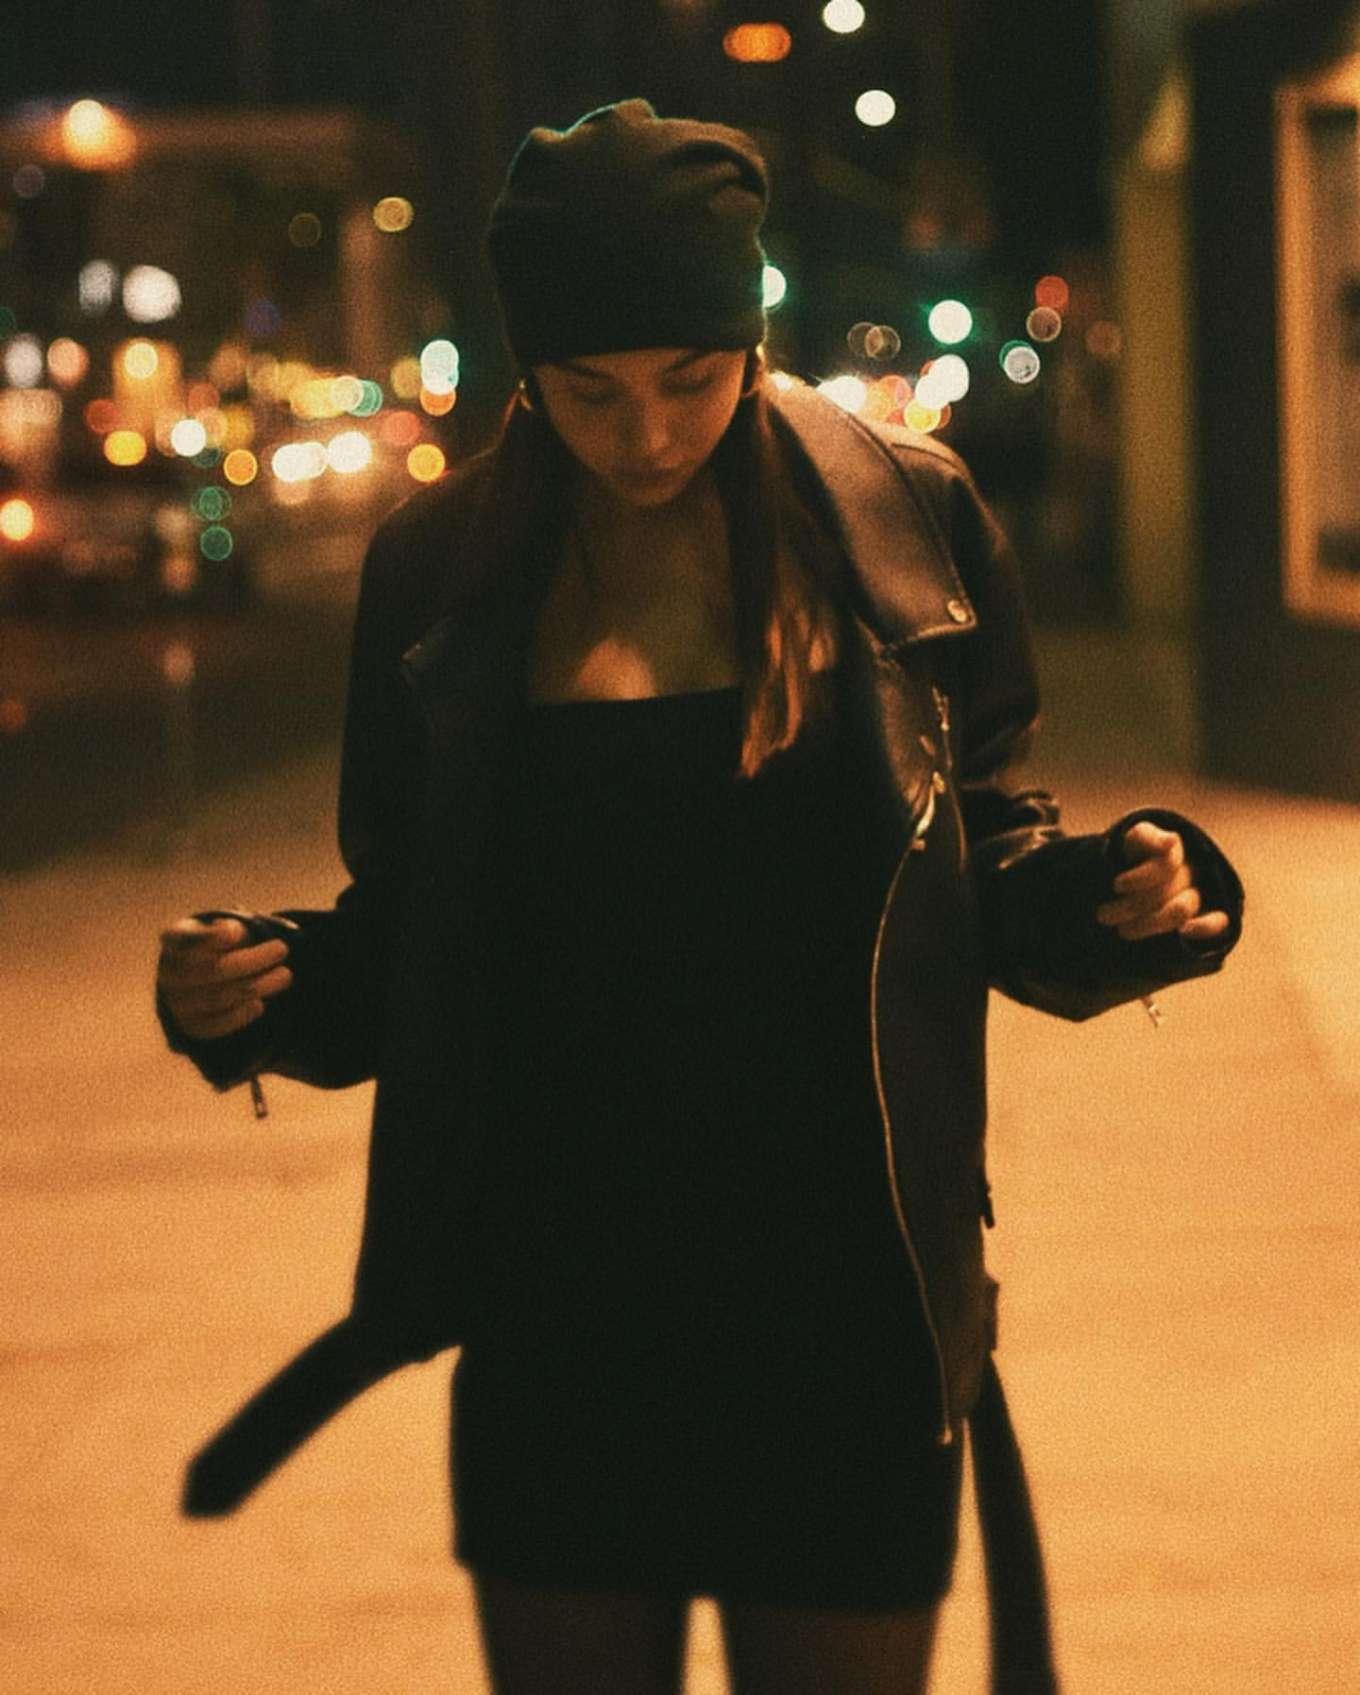 Alexis Ren - Melissa Cartagena Photoshoot (November 2019)